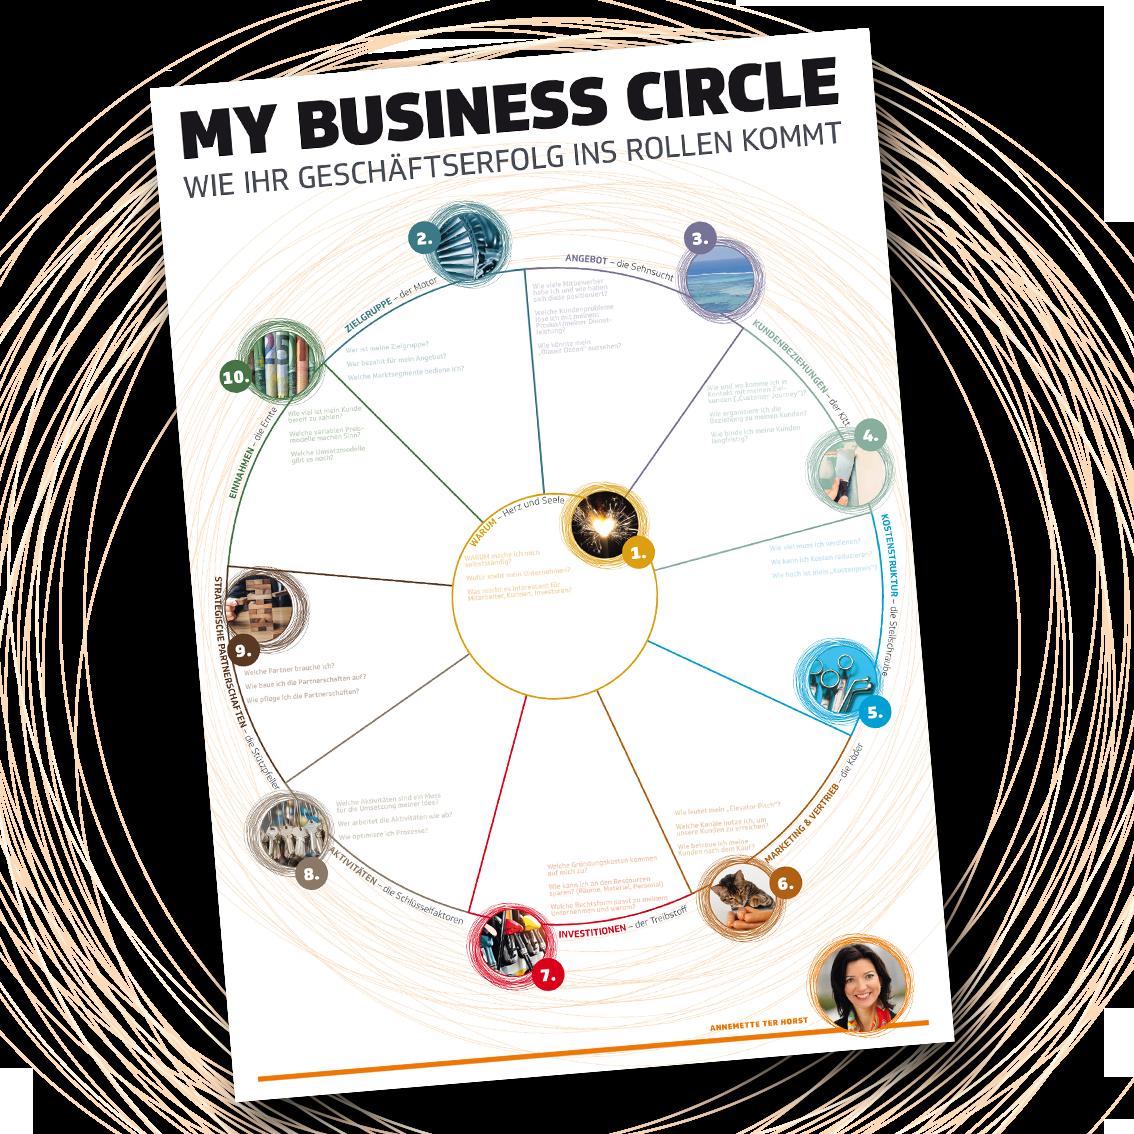 https://www.mybusinesscircle.de/wp-content/uploads/2019/05/Chart-Teaser_frei.png